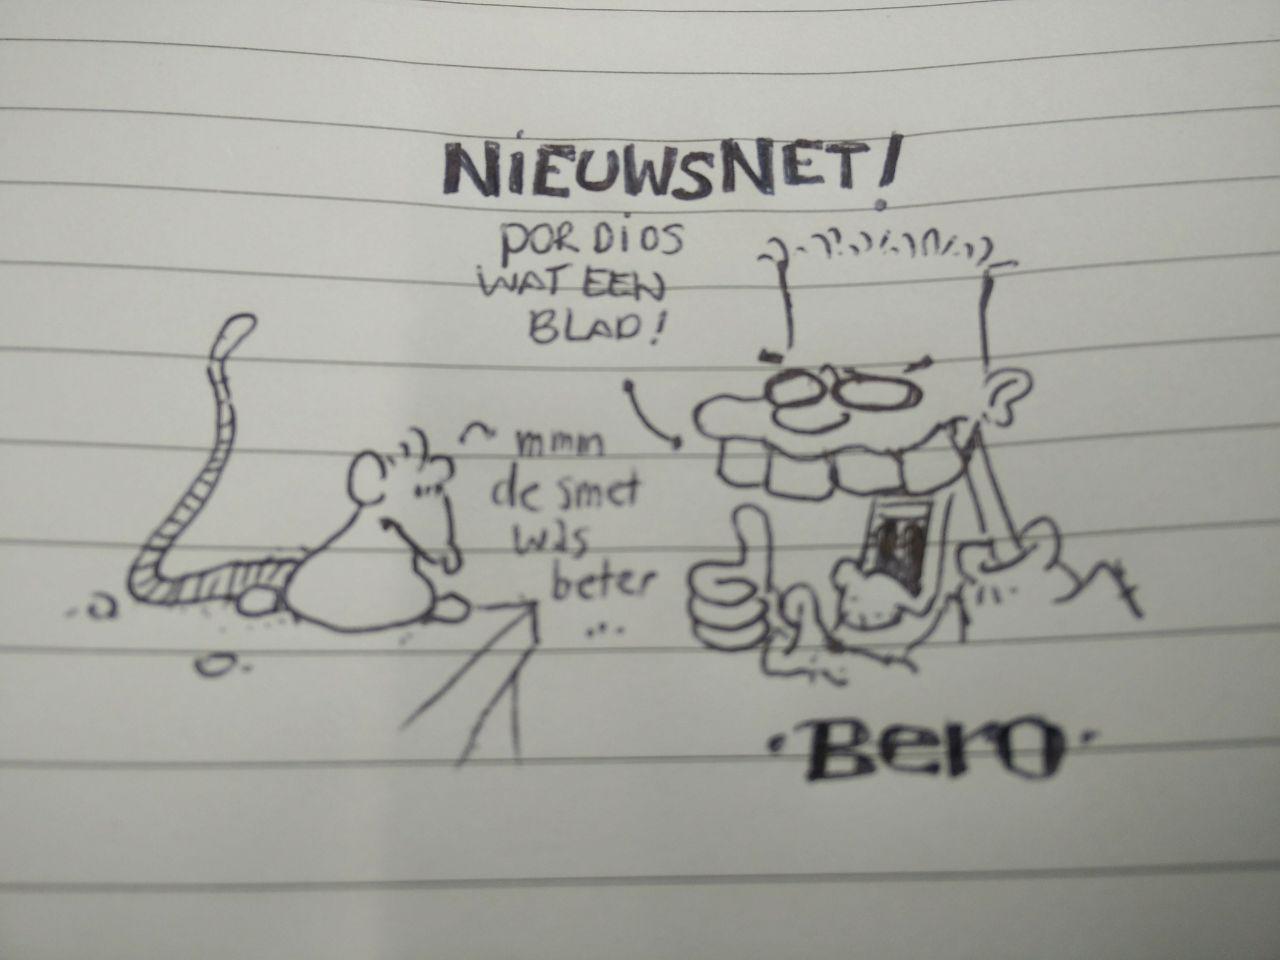 http://www.beroco.nl/images/peter.jpg